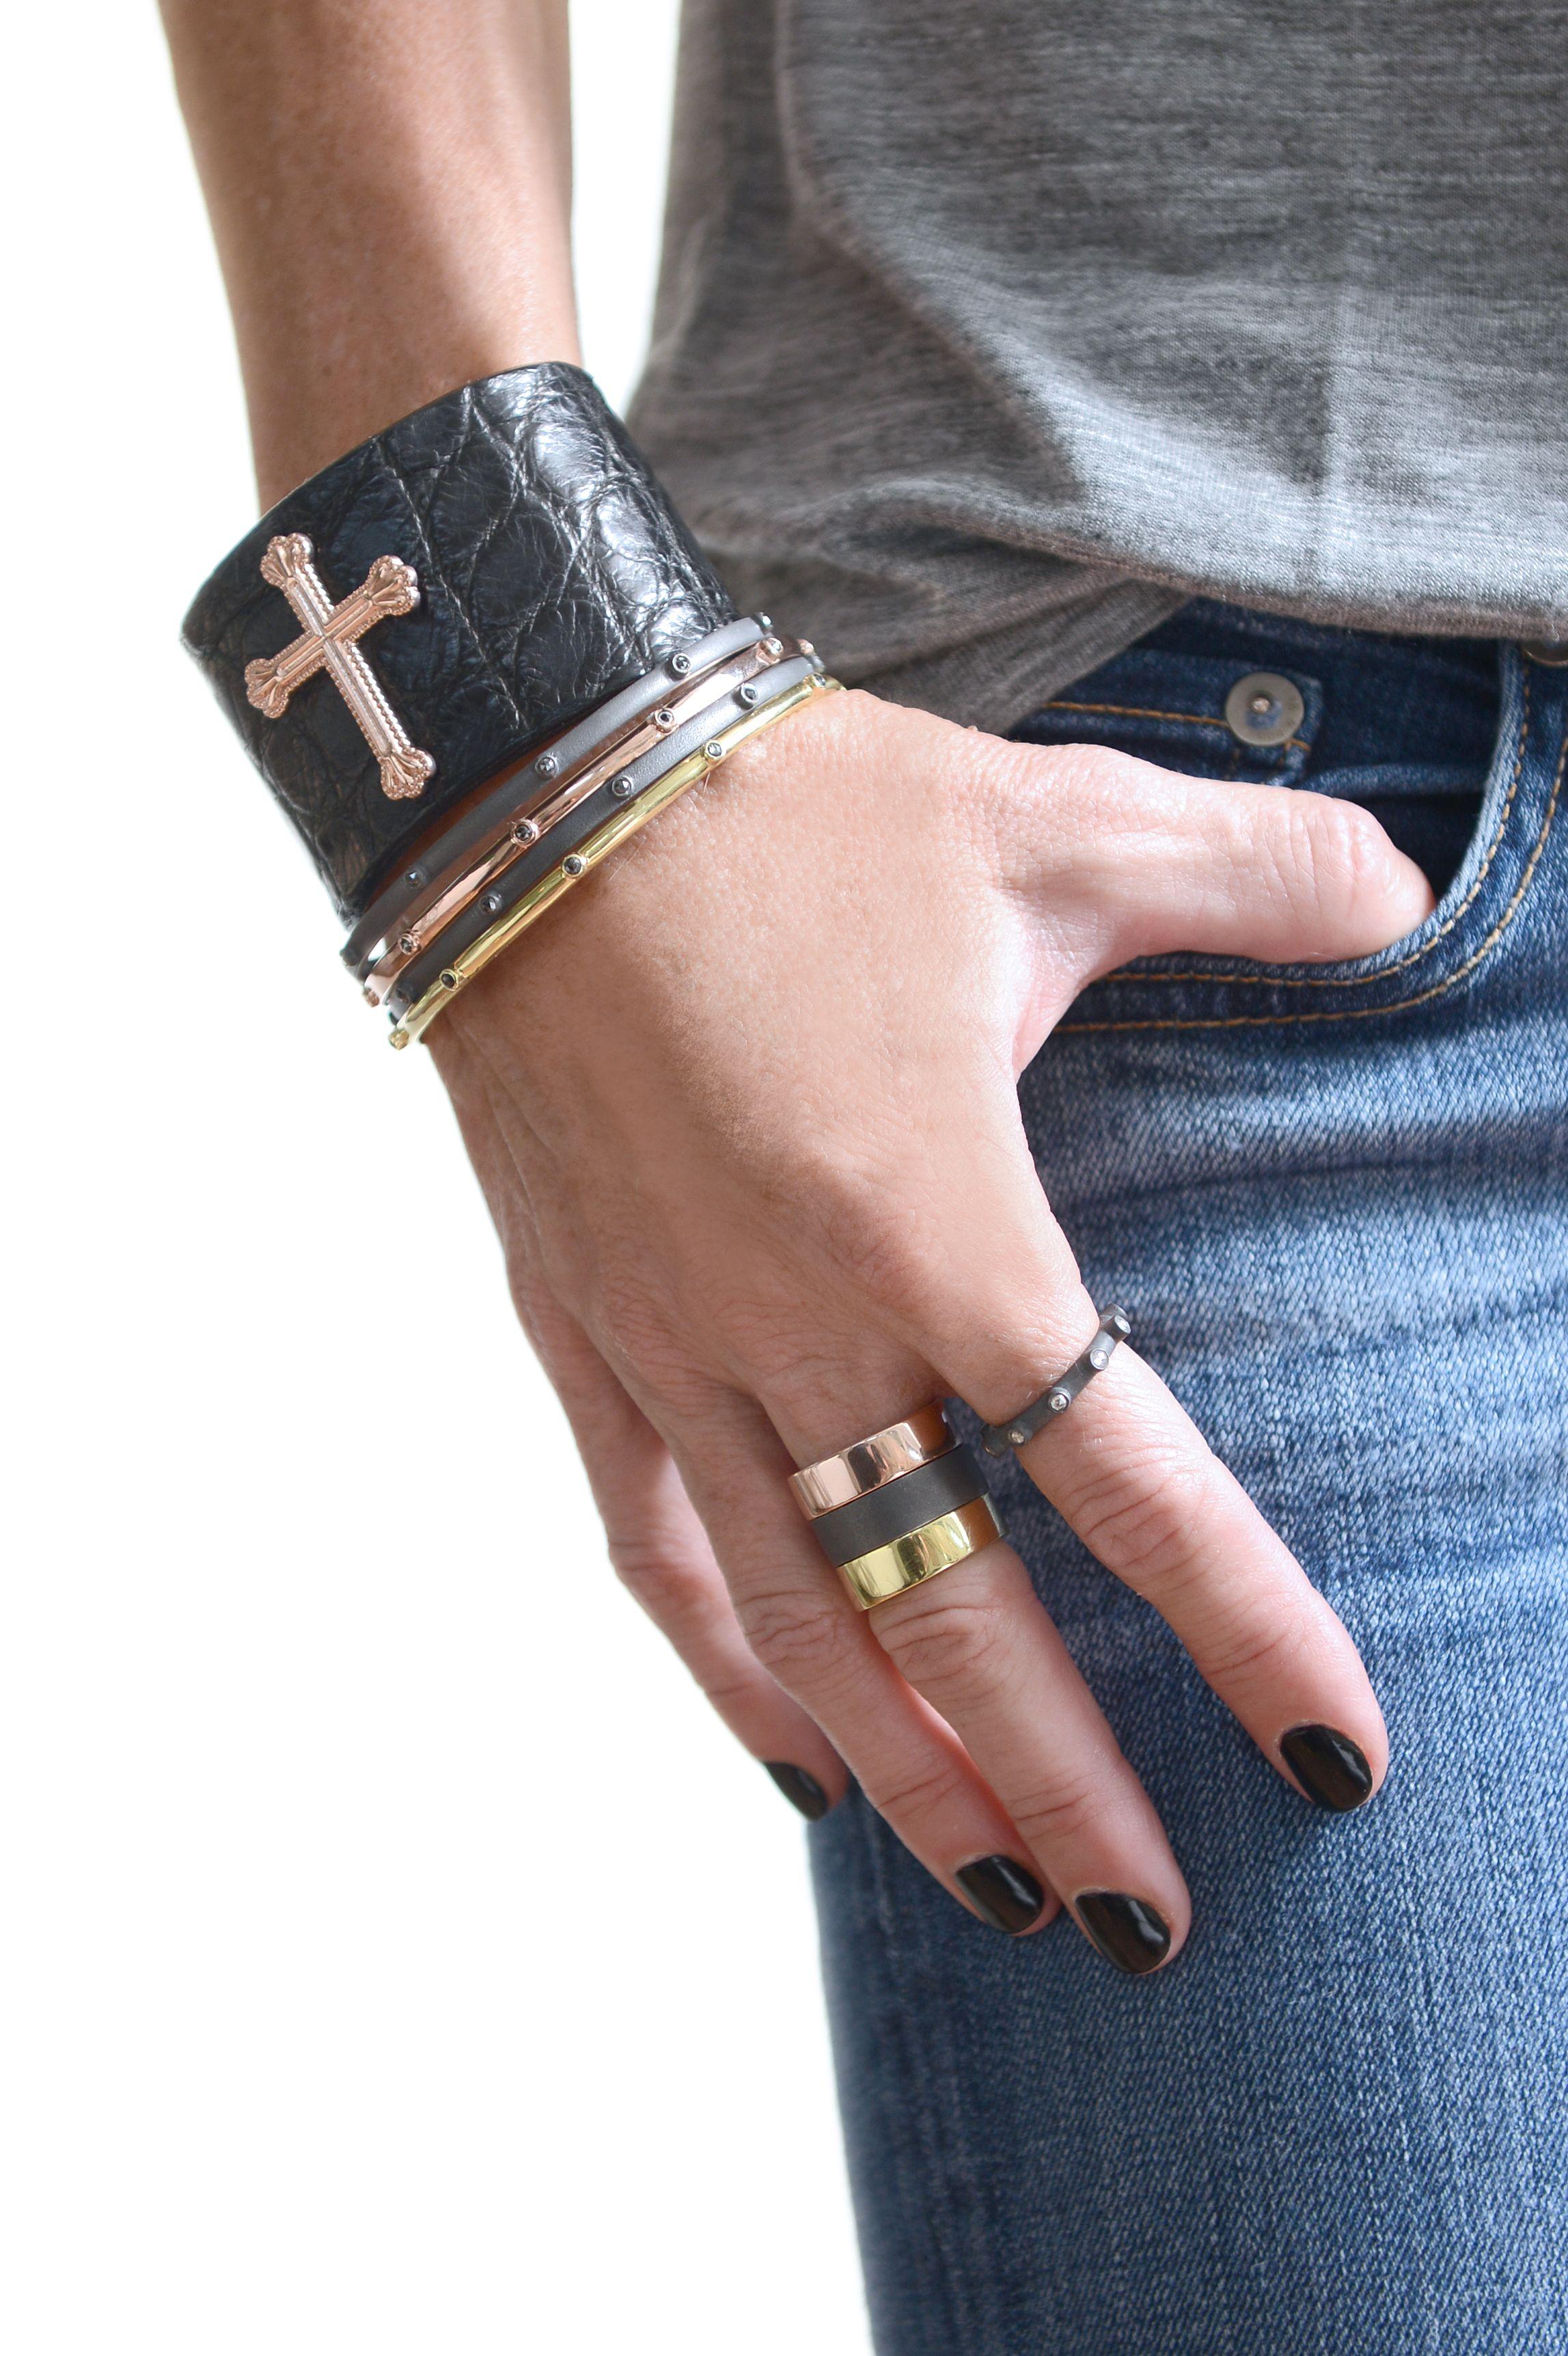 KATIE design Jewelry Crown the Cross Alligator Cuff Rosary